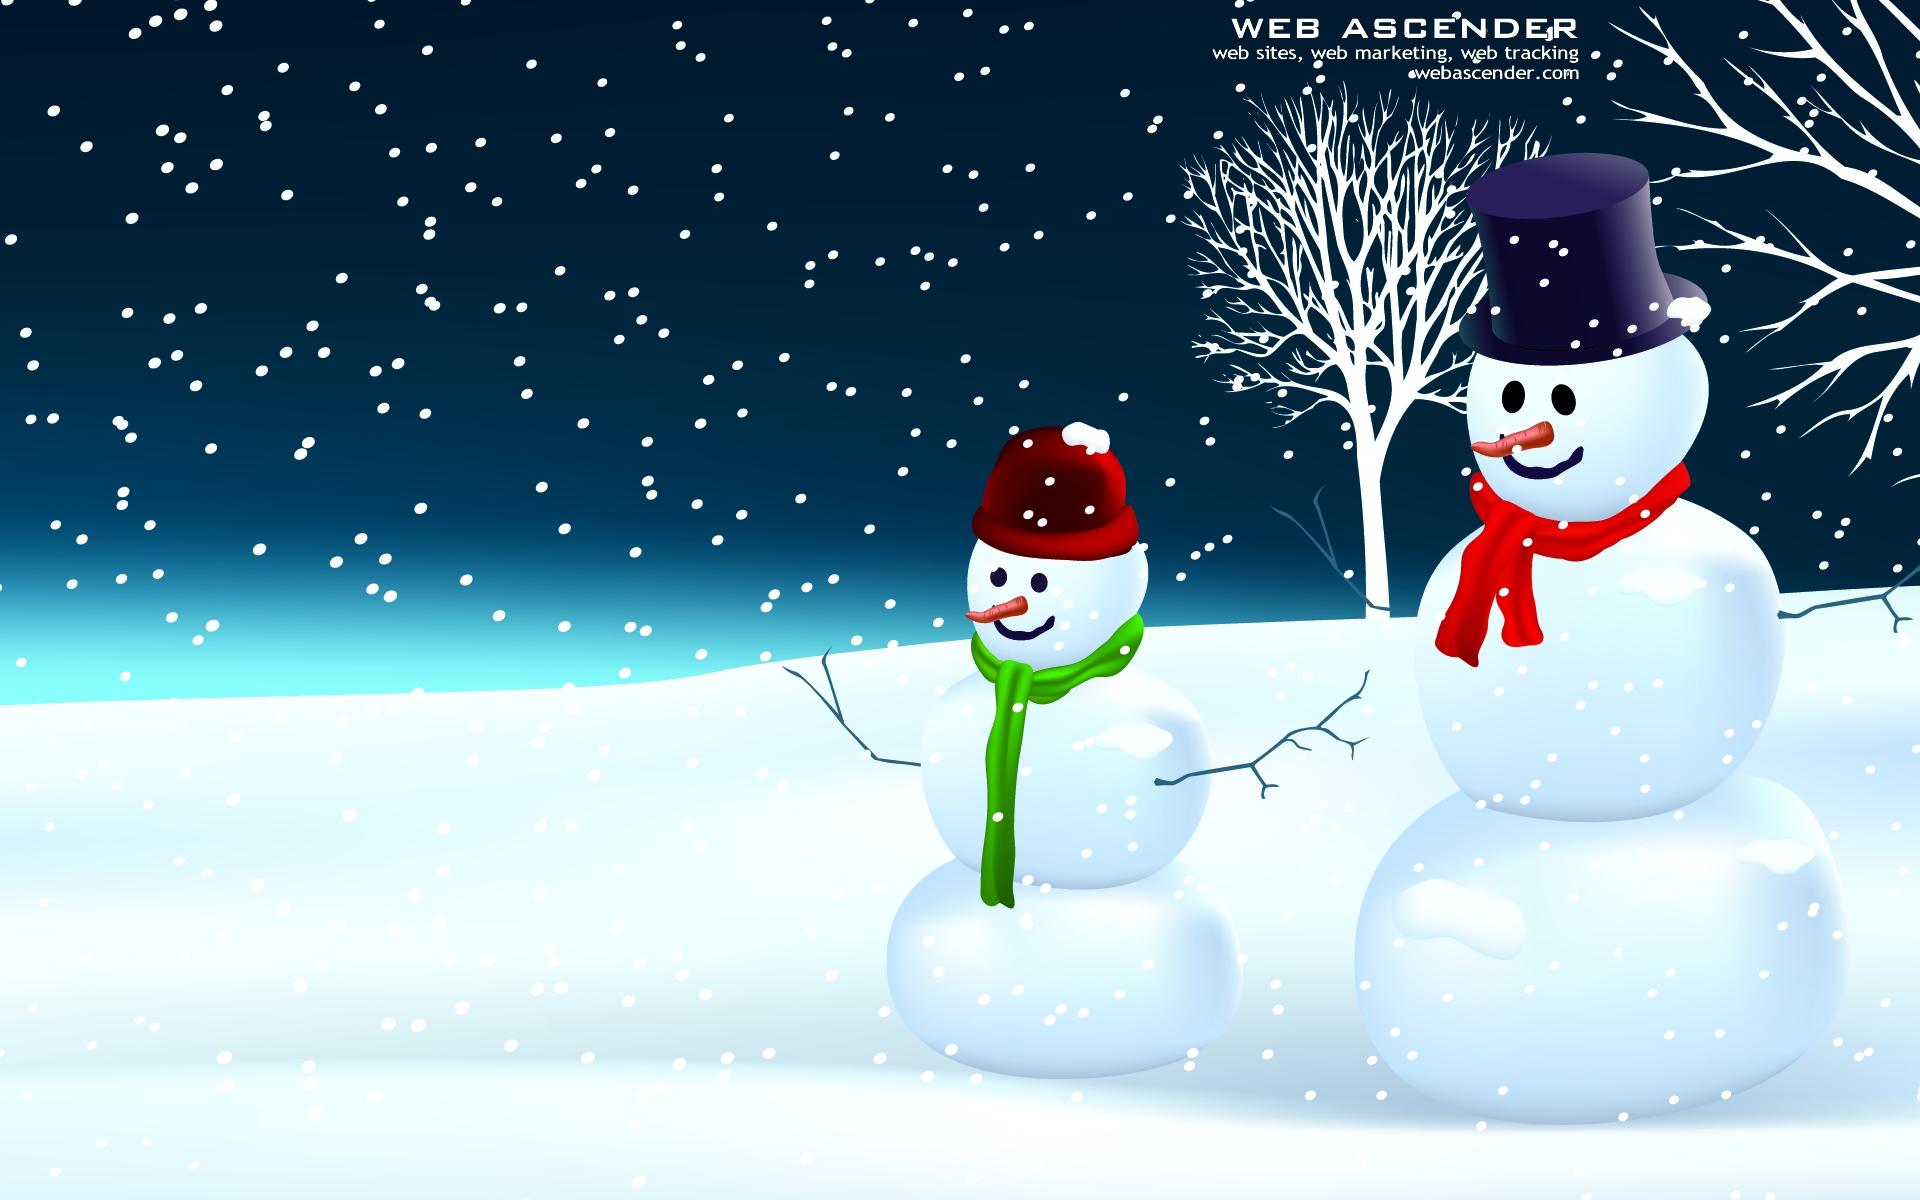 Snowman Wallpaper Widescreen Image Gallery 1920x1200